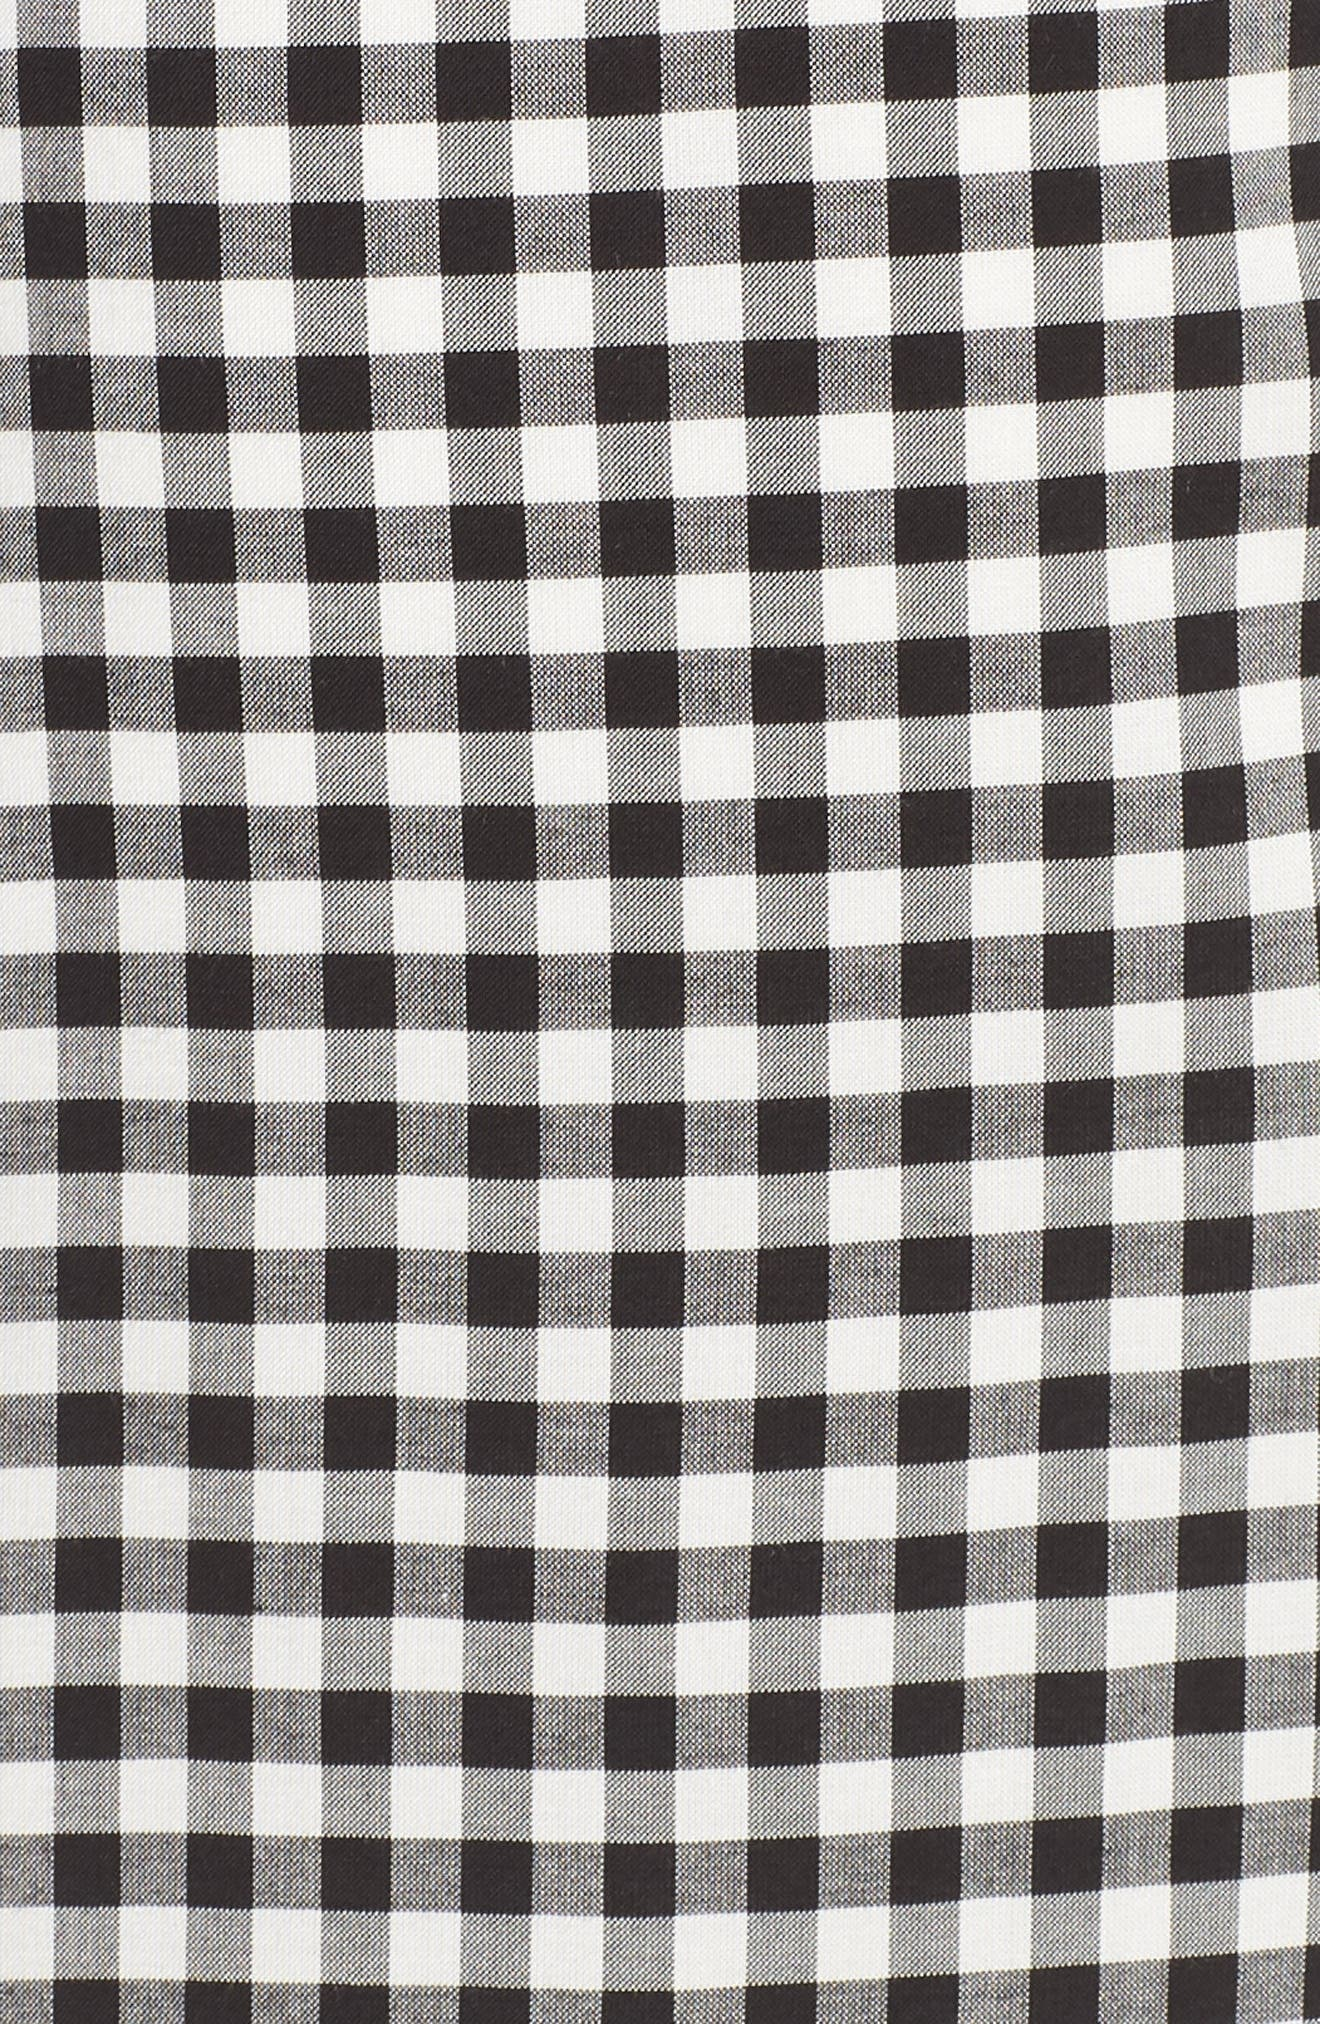 Eddie Gingham Dress,                             Alternate thumbnail 5, color,                             Black